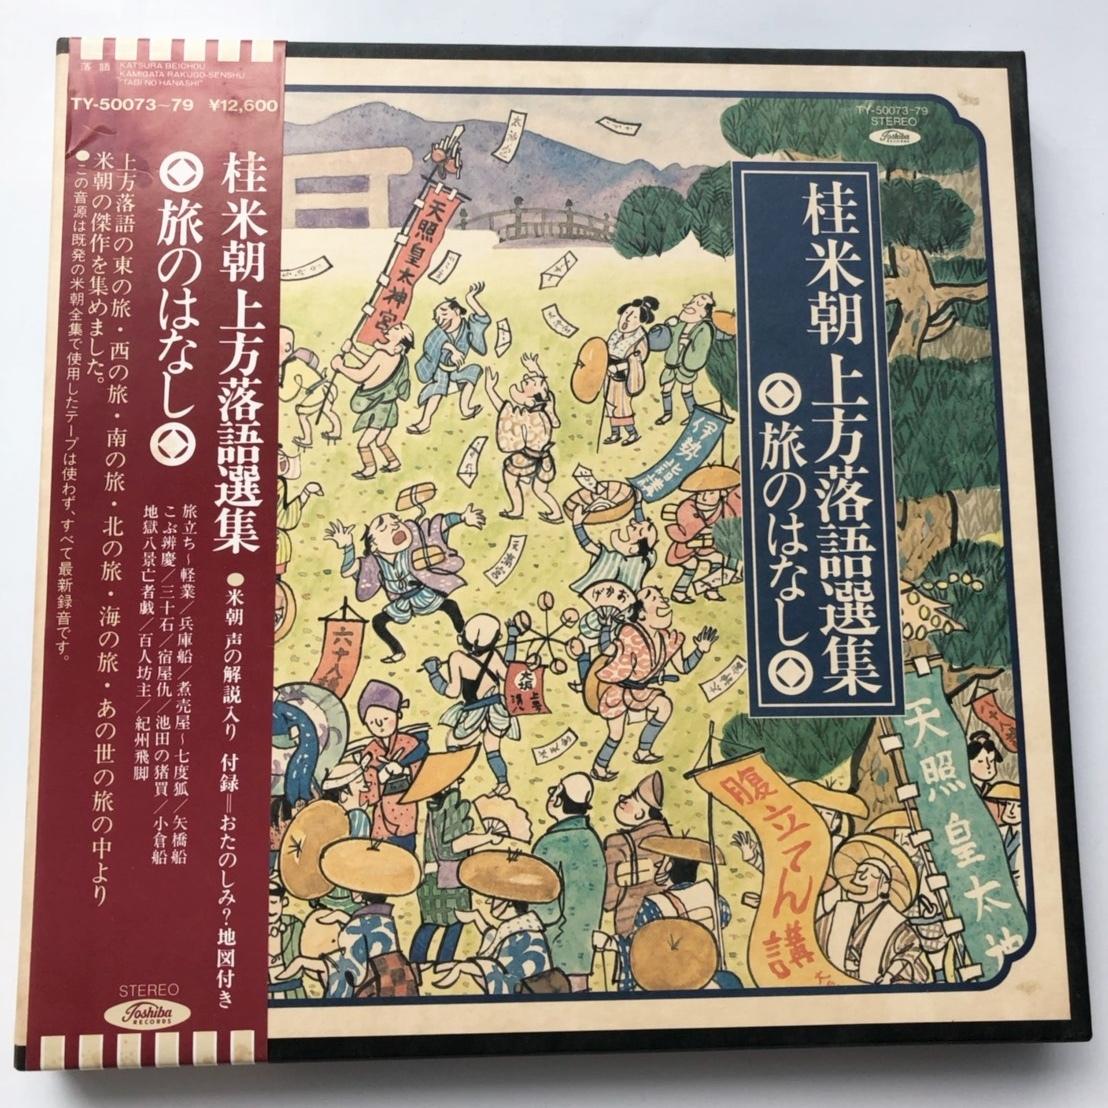 LPレコード7枚組 桂米朝 上方落語選集~旅のはなし~_画像1